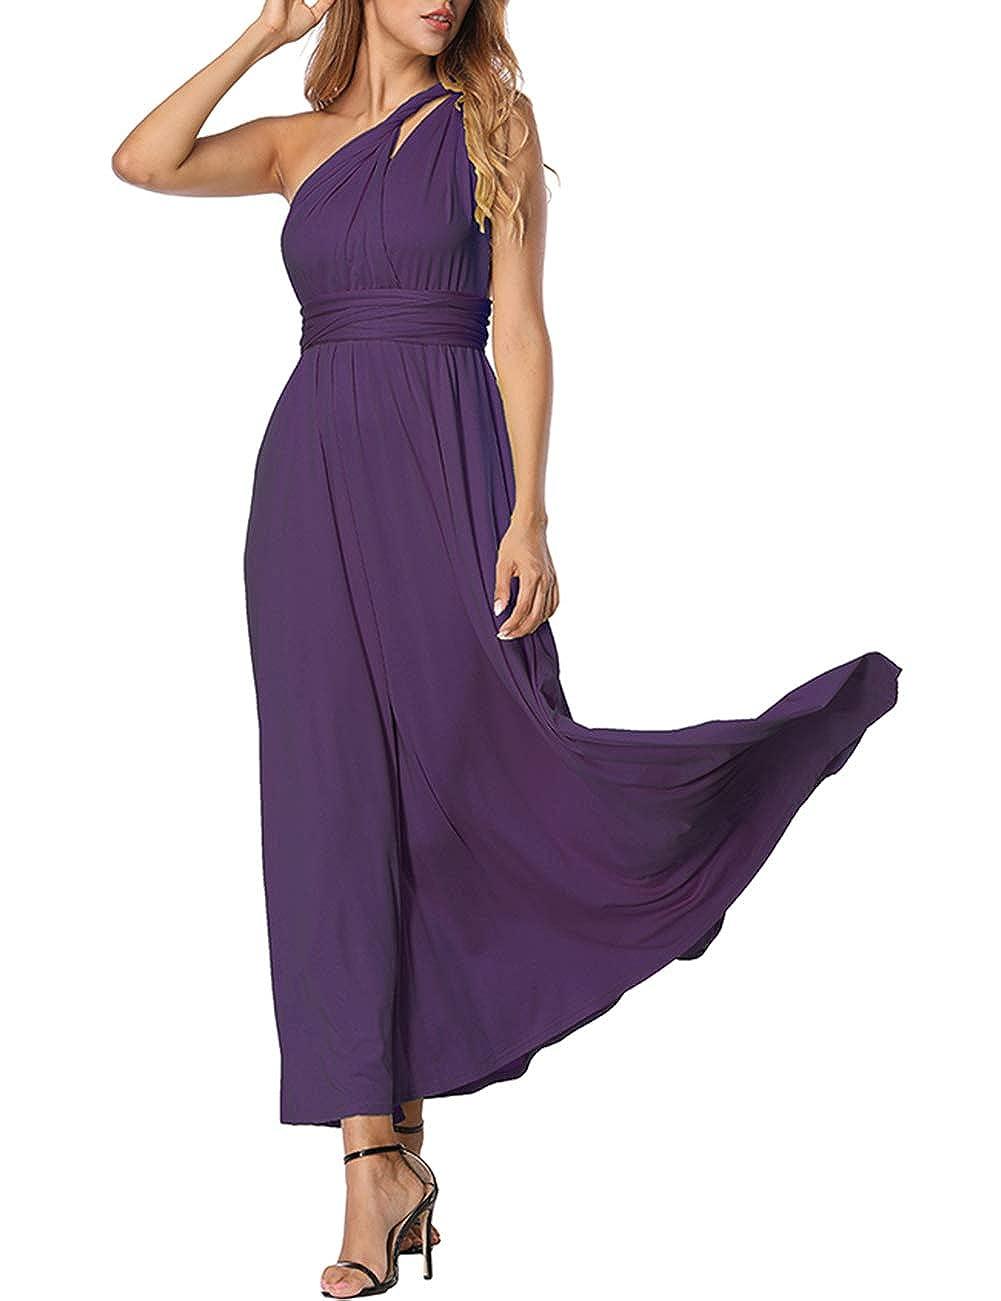 TALLA M(ES 40-44). FeelinGirl Mujer Vestido de Noche Longitud Máxima Falda Fiesta Cóctel Tirantes Convertibles Multi-Manera Púrpura Oscuro M(ES 40-44)